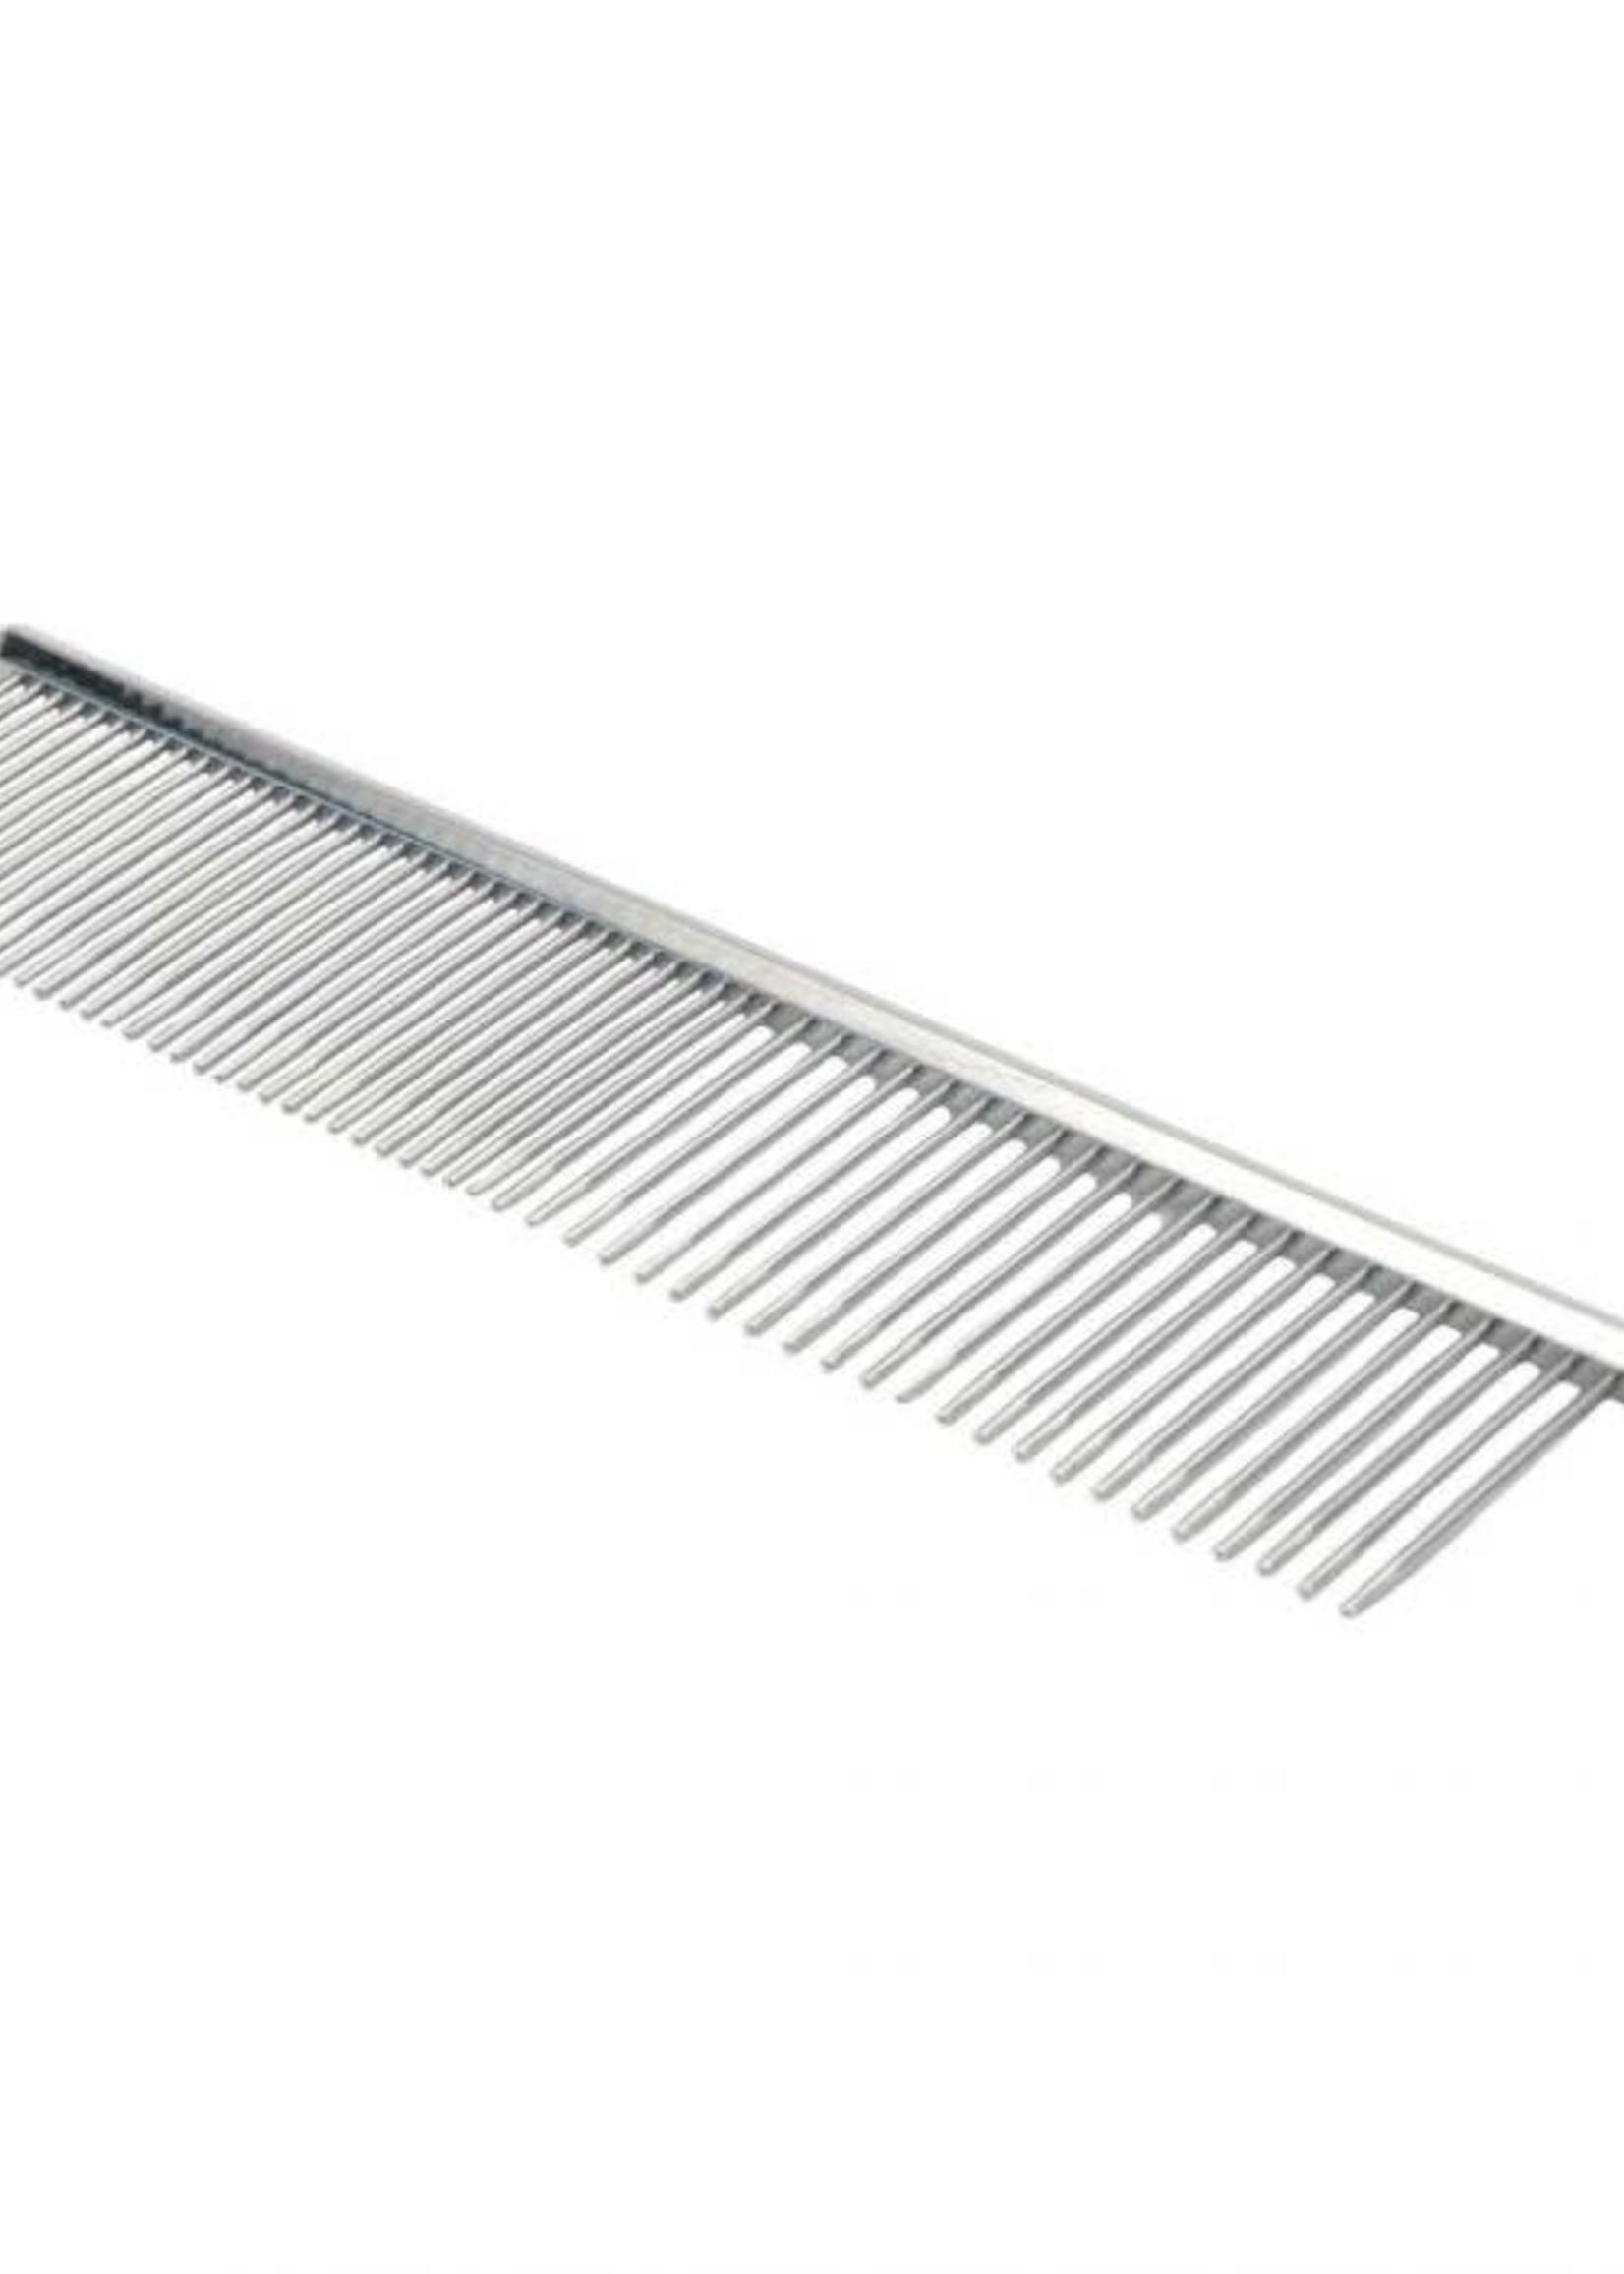 Coastal® Grooming Comb for Medium and Coarse Coats